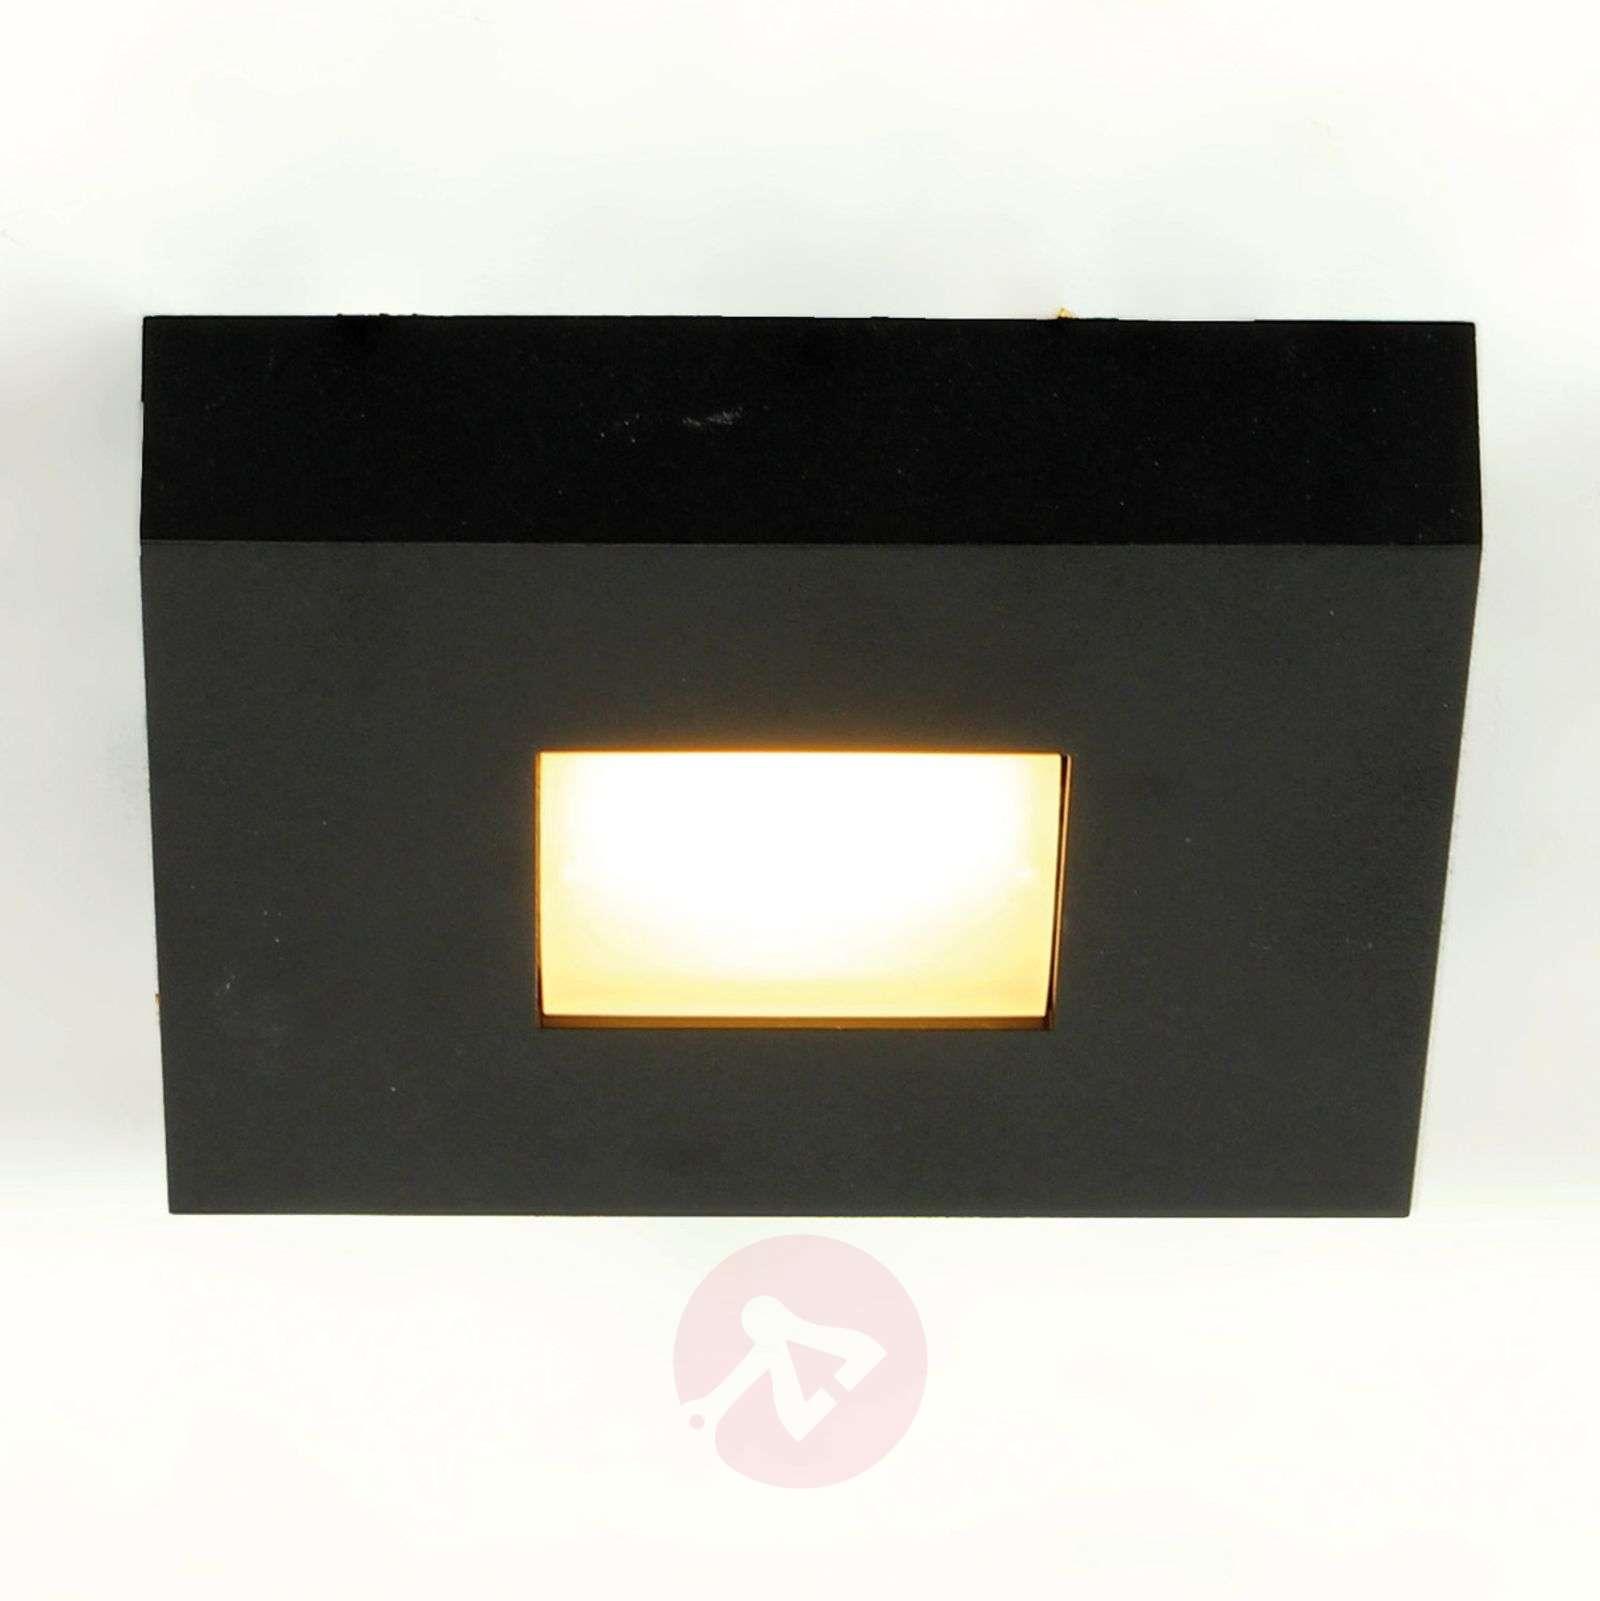 LED-kattovalaisin Cubus mustana-1556135-01